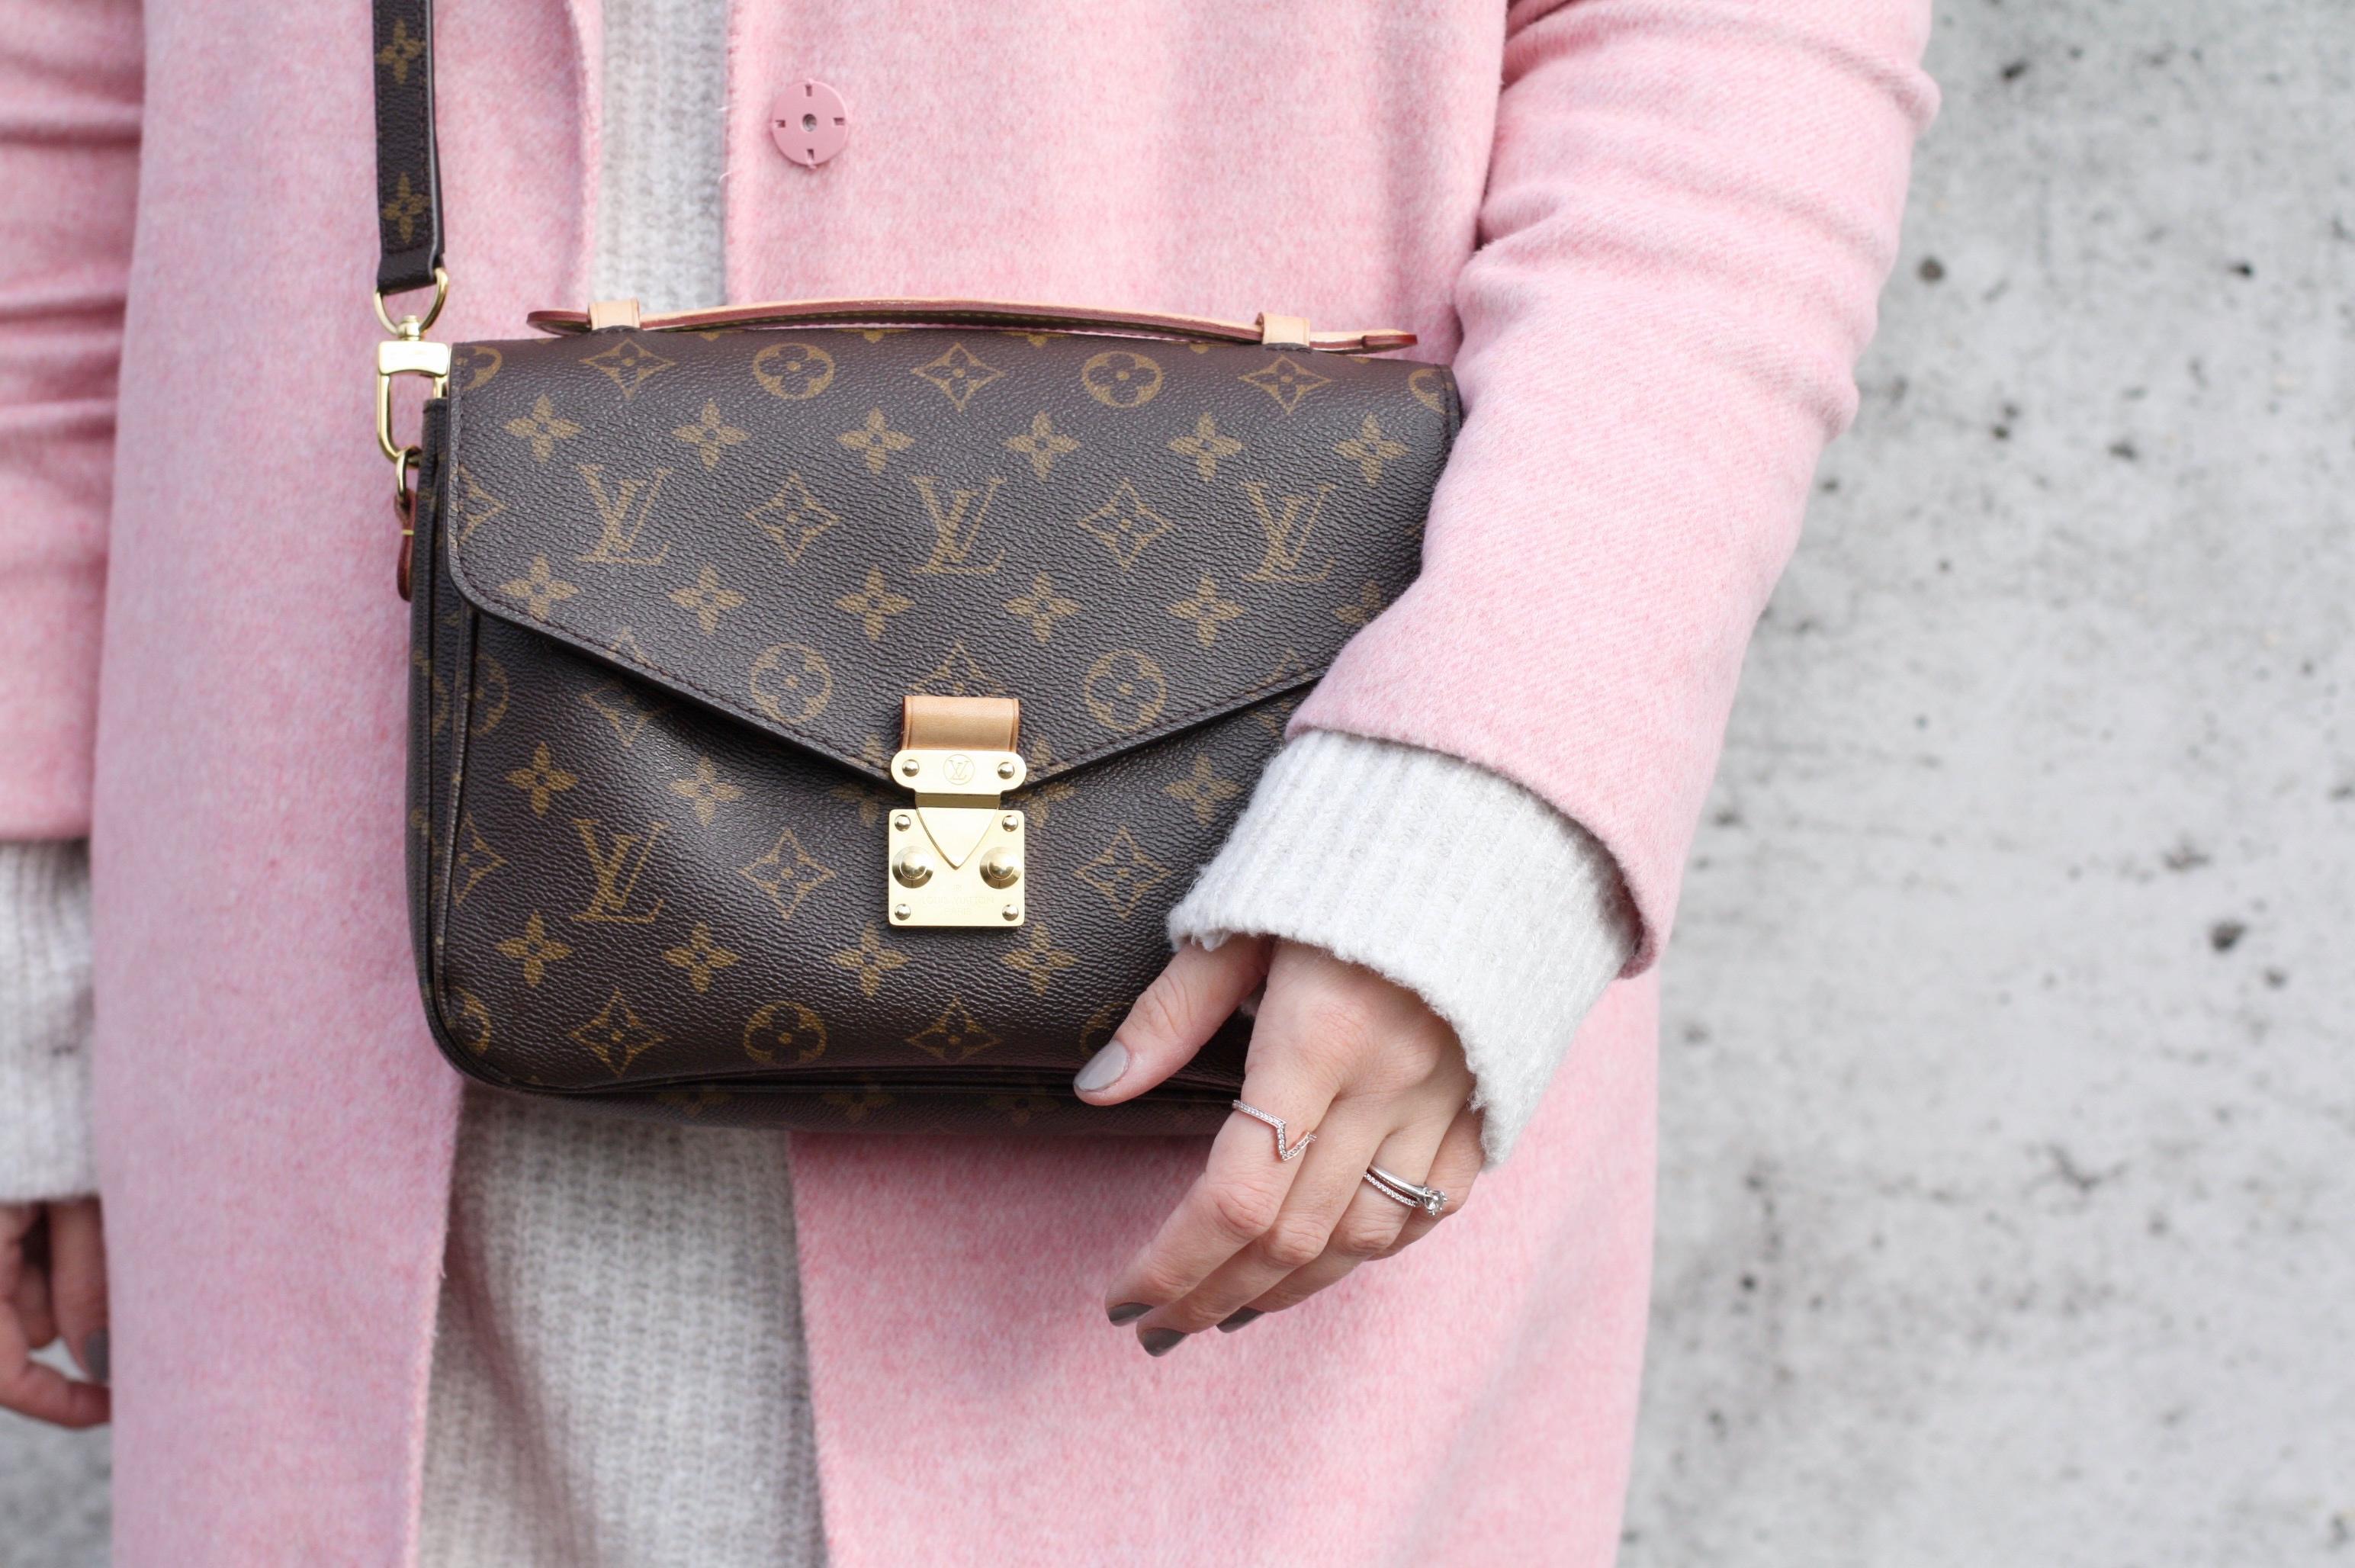 Louis Vuitton Pochette Métis, Maison Pazi, Patrizia Philp, Zara Mantel Rosa